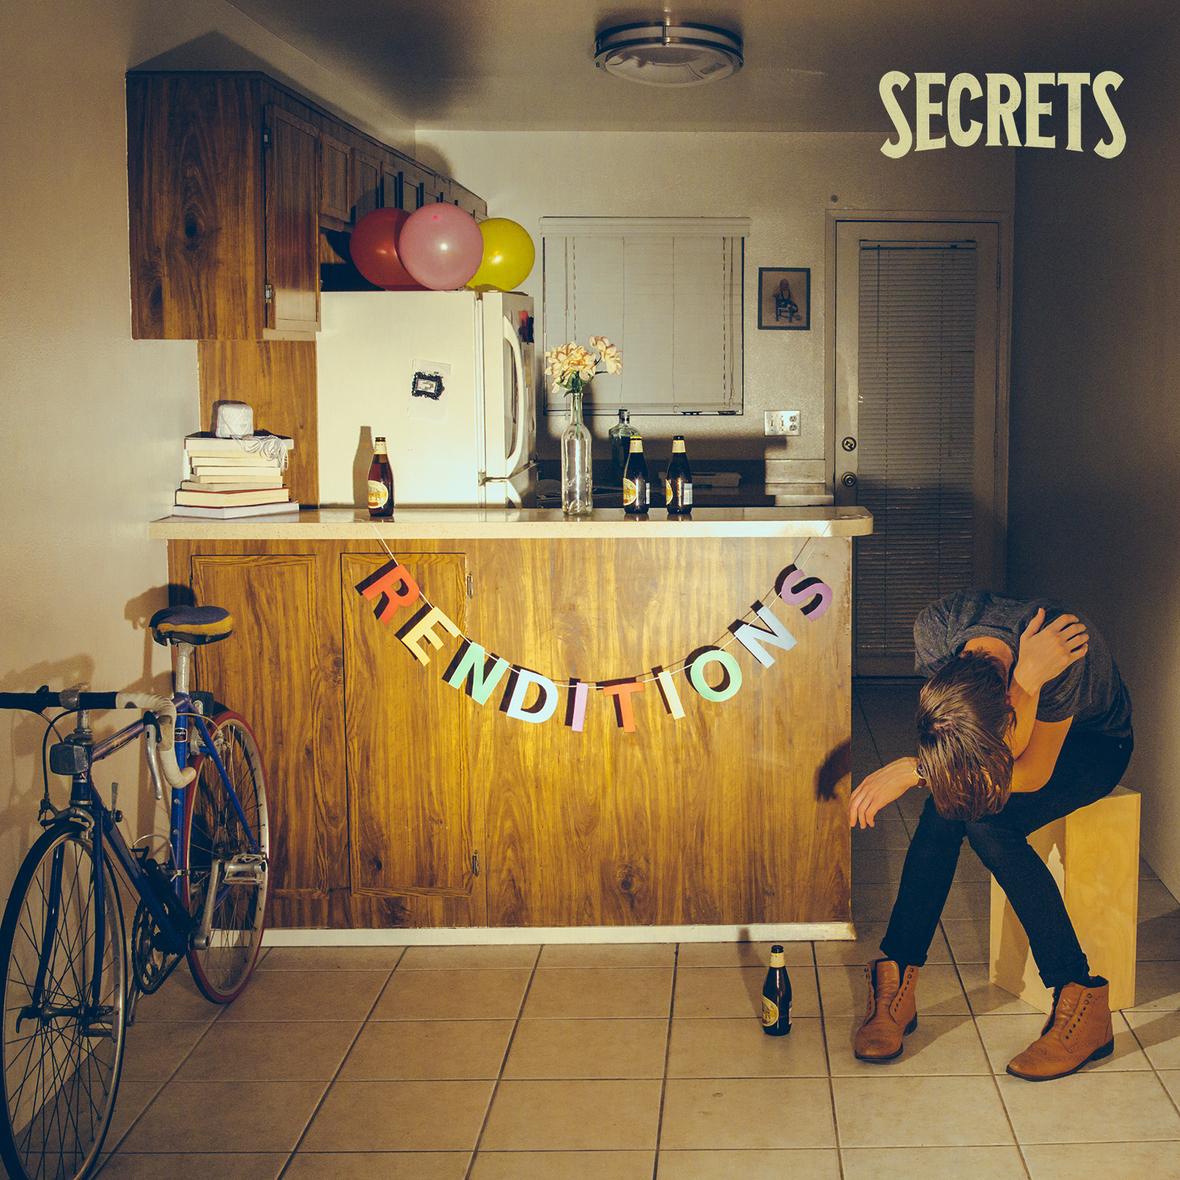 secrets renditions cover art